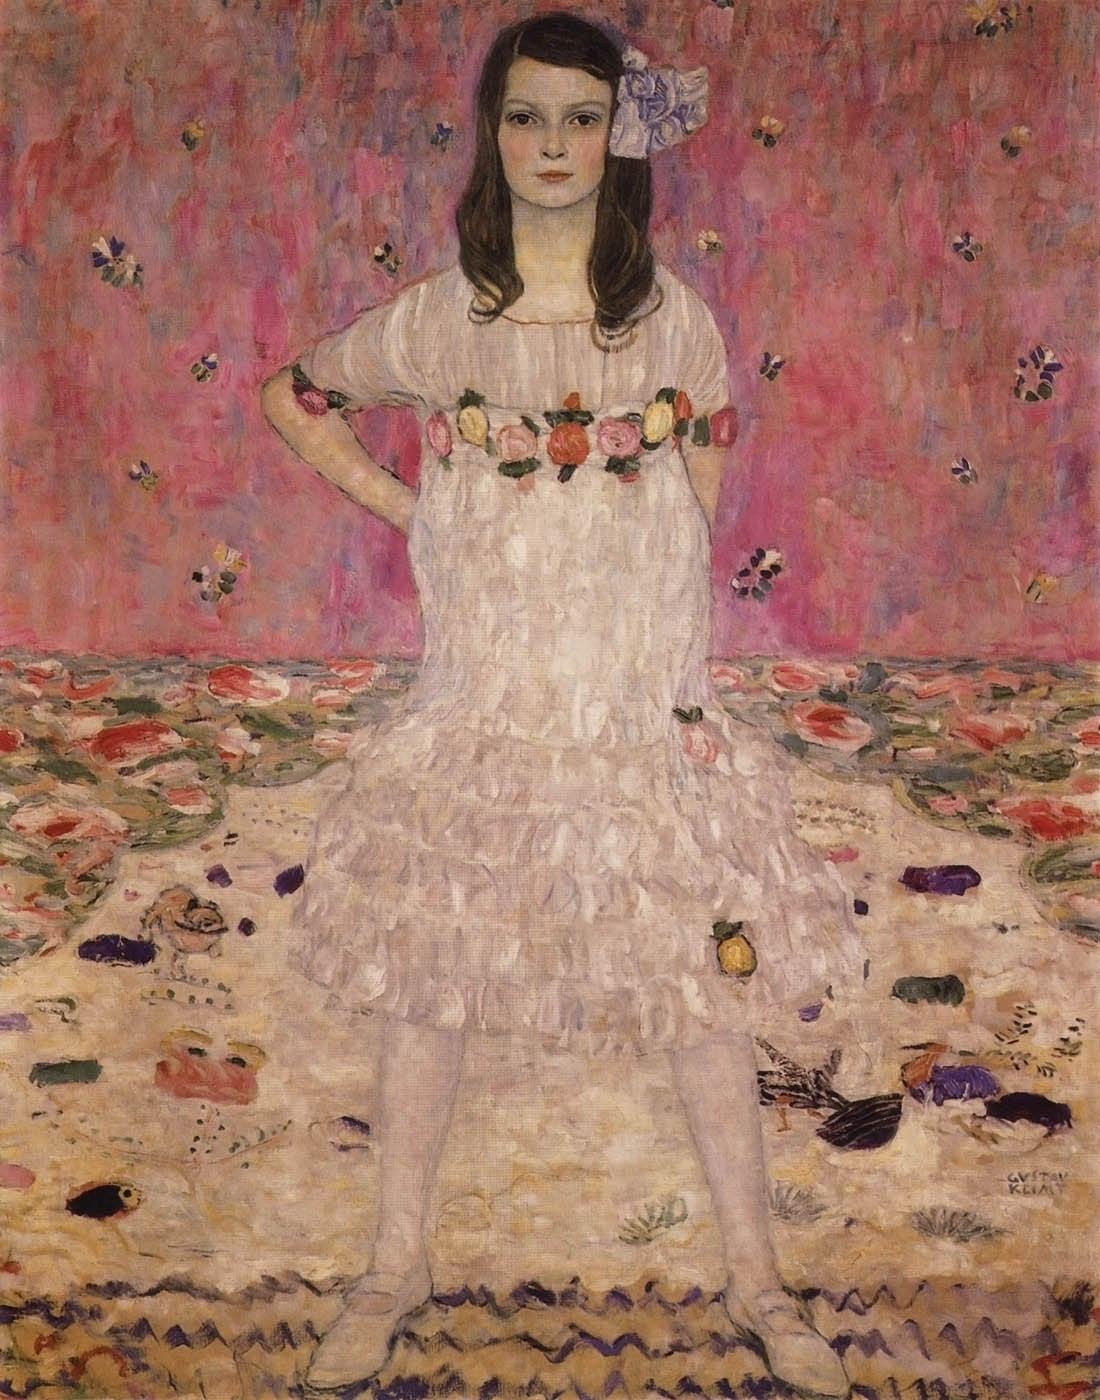 Klimt, Portrait of Madam Primavesi, Giclee Limited Edition